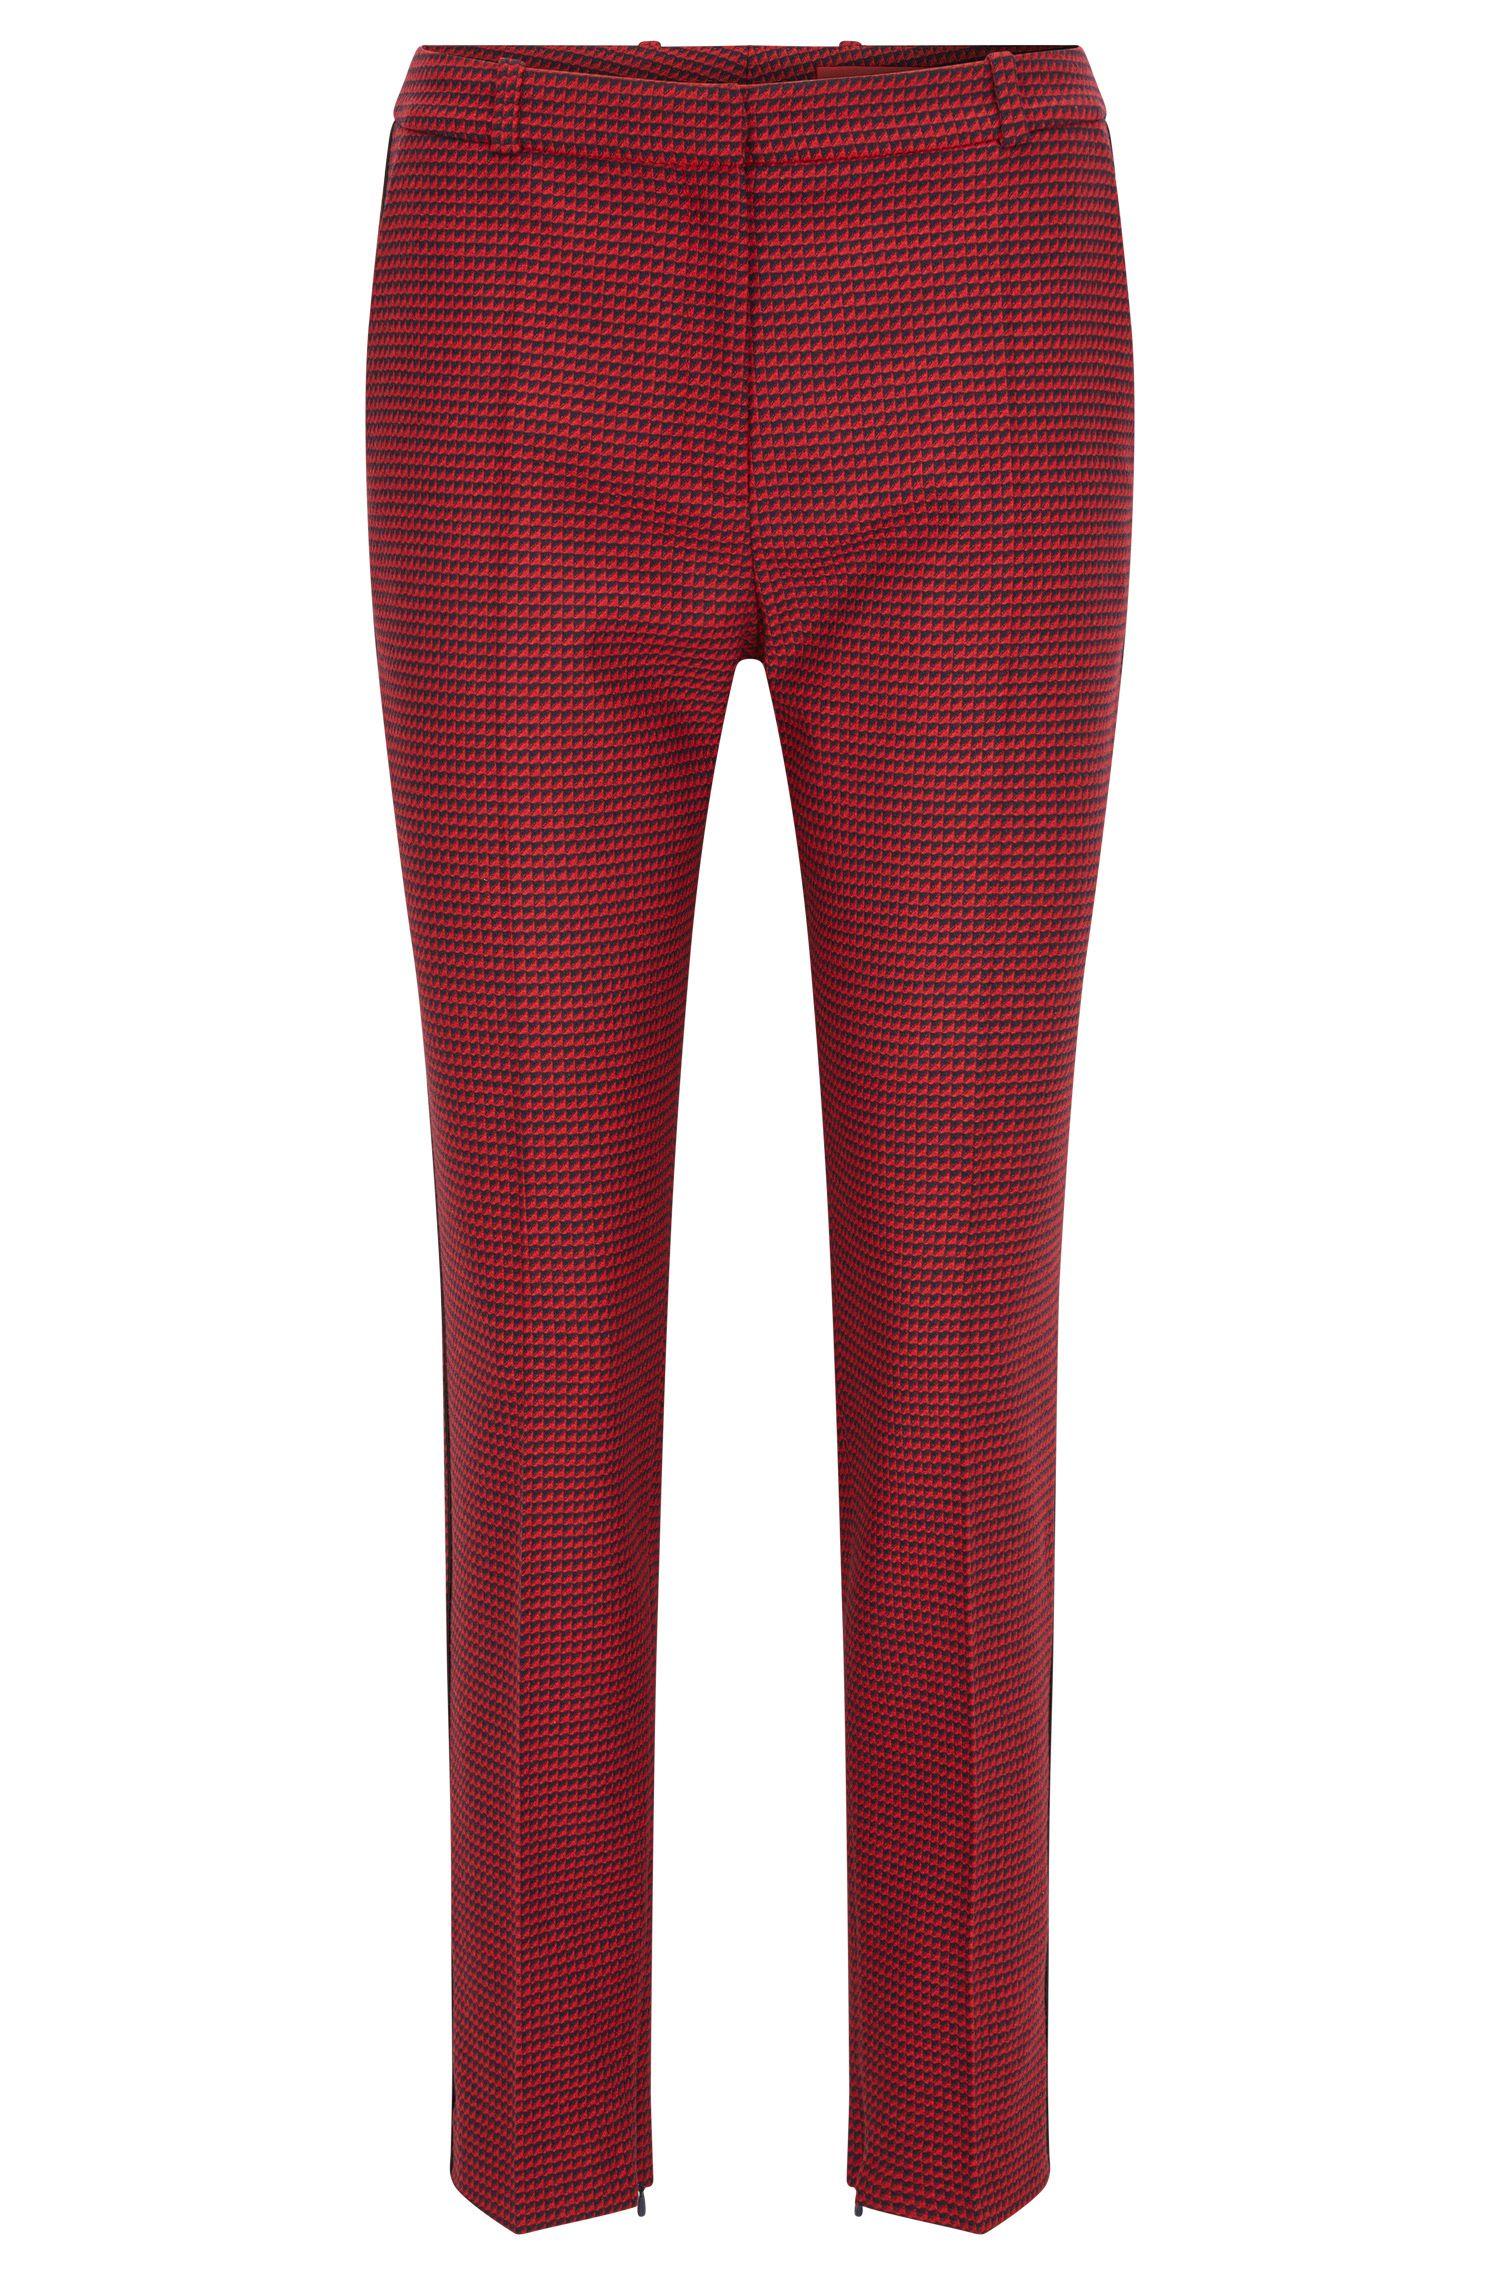 Gemusterte Slim-Fit Hose aus elastischem Material-Mix mit Wolle